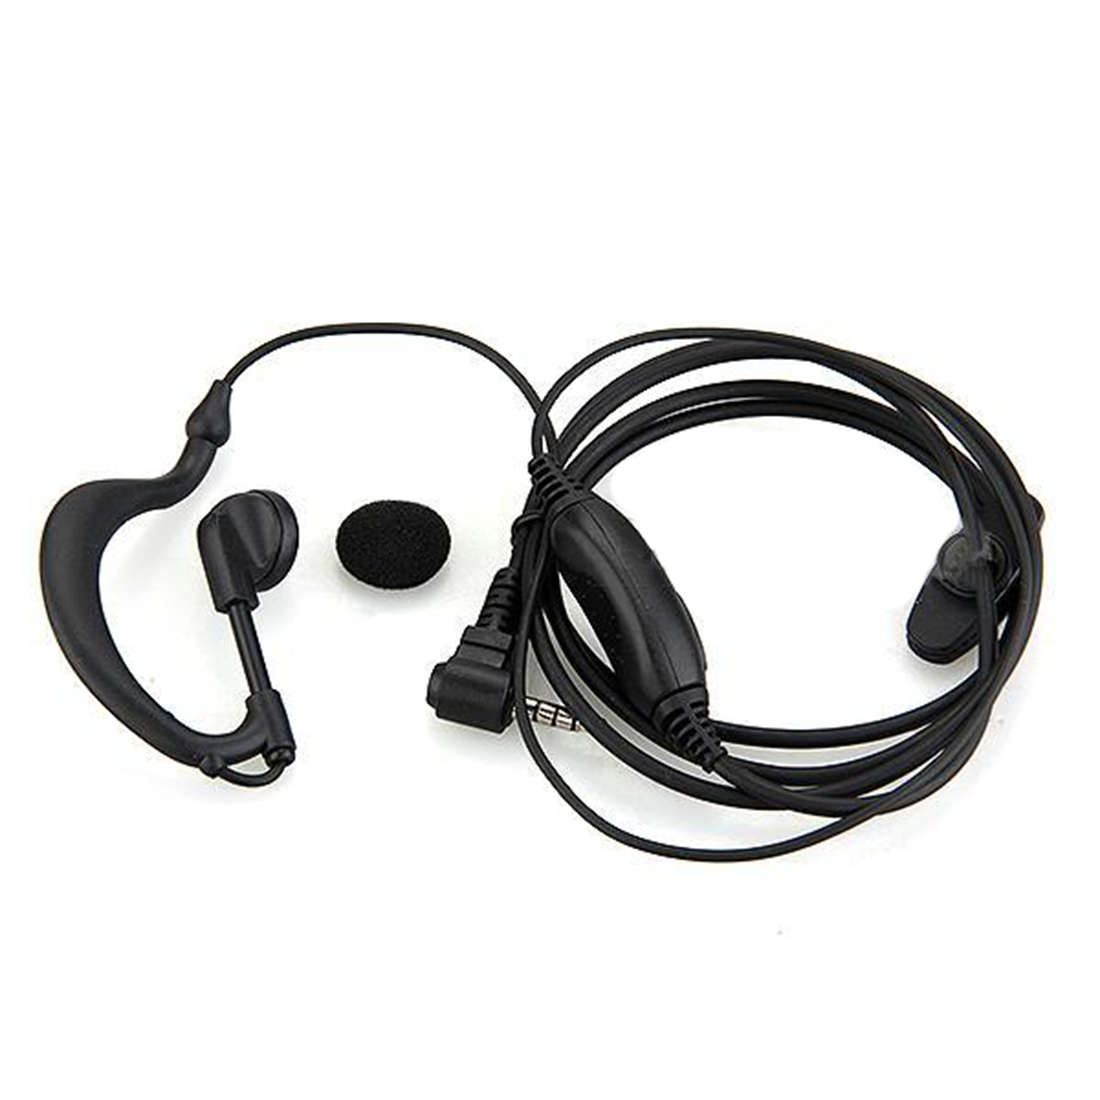 2015 Wholesale In-ear Imitated hook Headset Earphone Headphones for Walkie Talkie Radio Black new(China (Mainland))